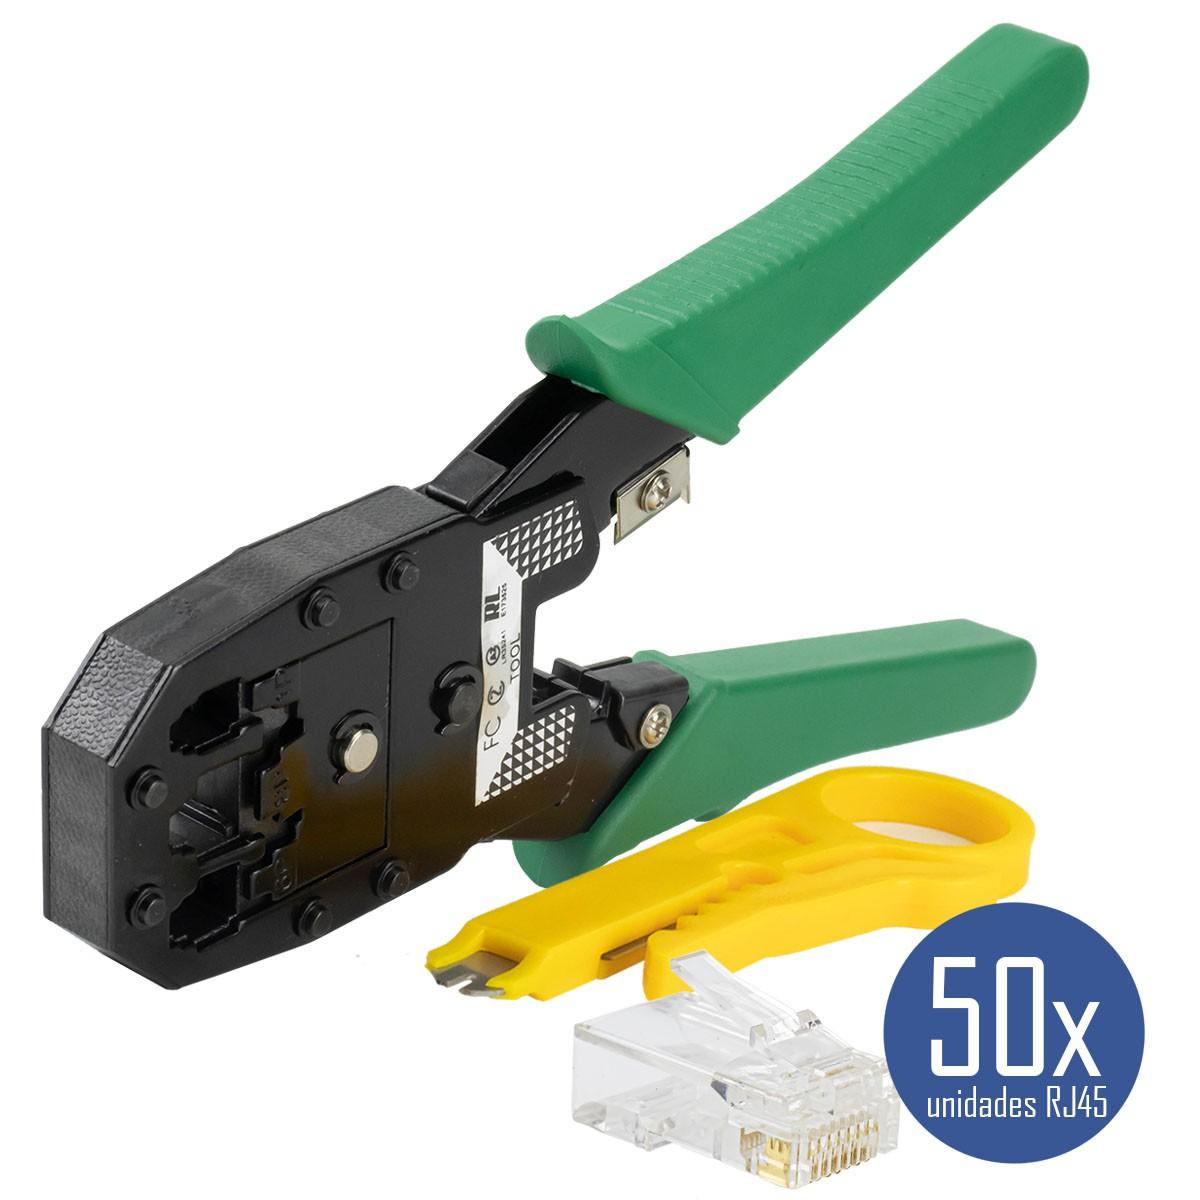 KIT Alicate de Crimpar 210c + Alicate p/ Crimpar Coaxial + Alicate Decapador Cabo Coaxial + 50x Conectores RJ45